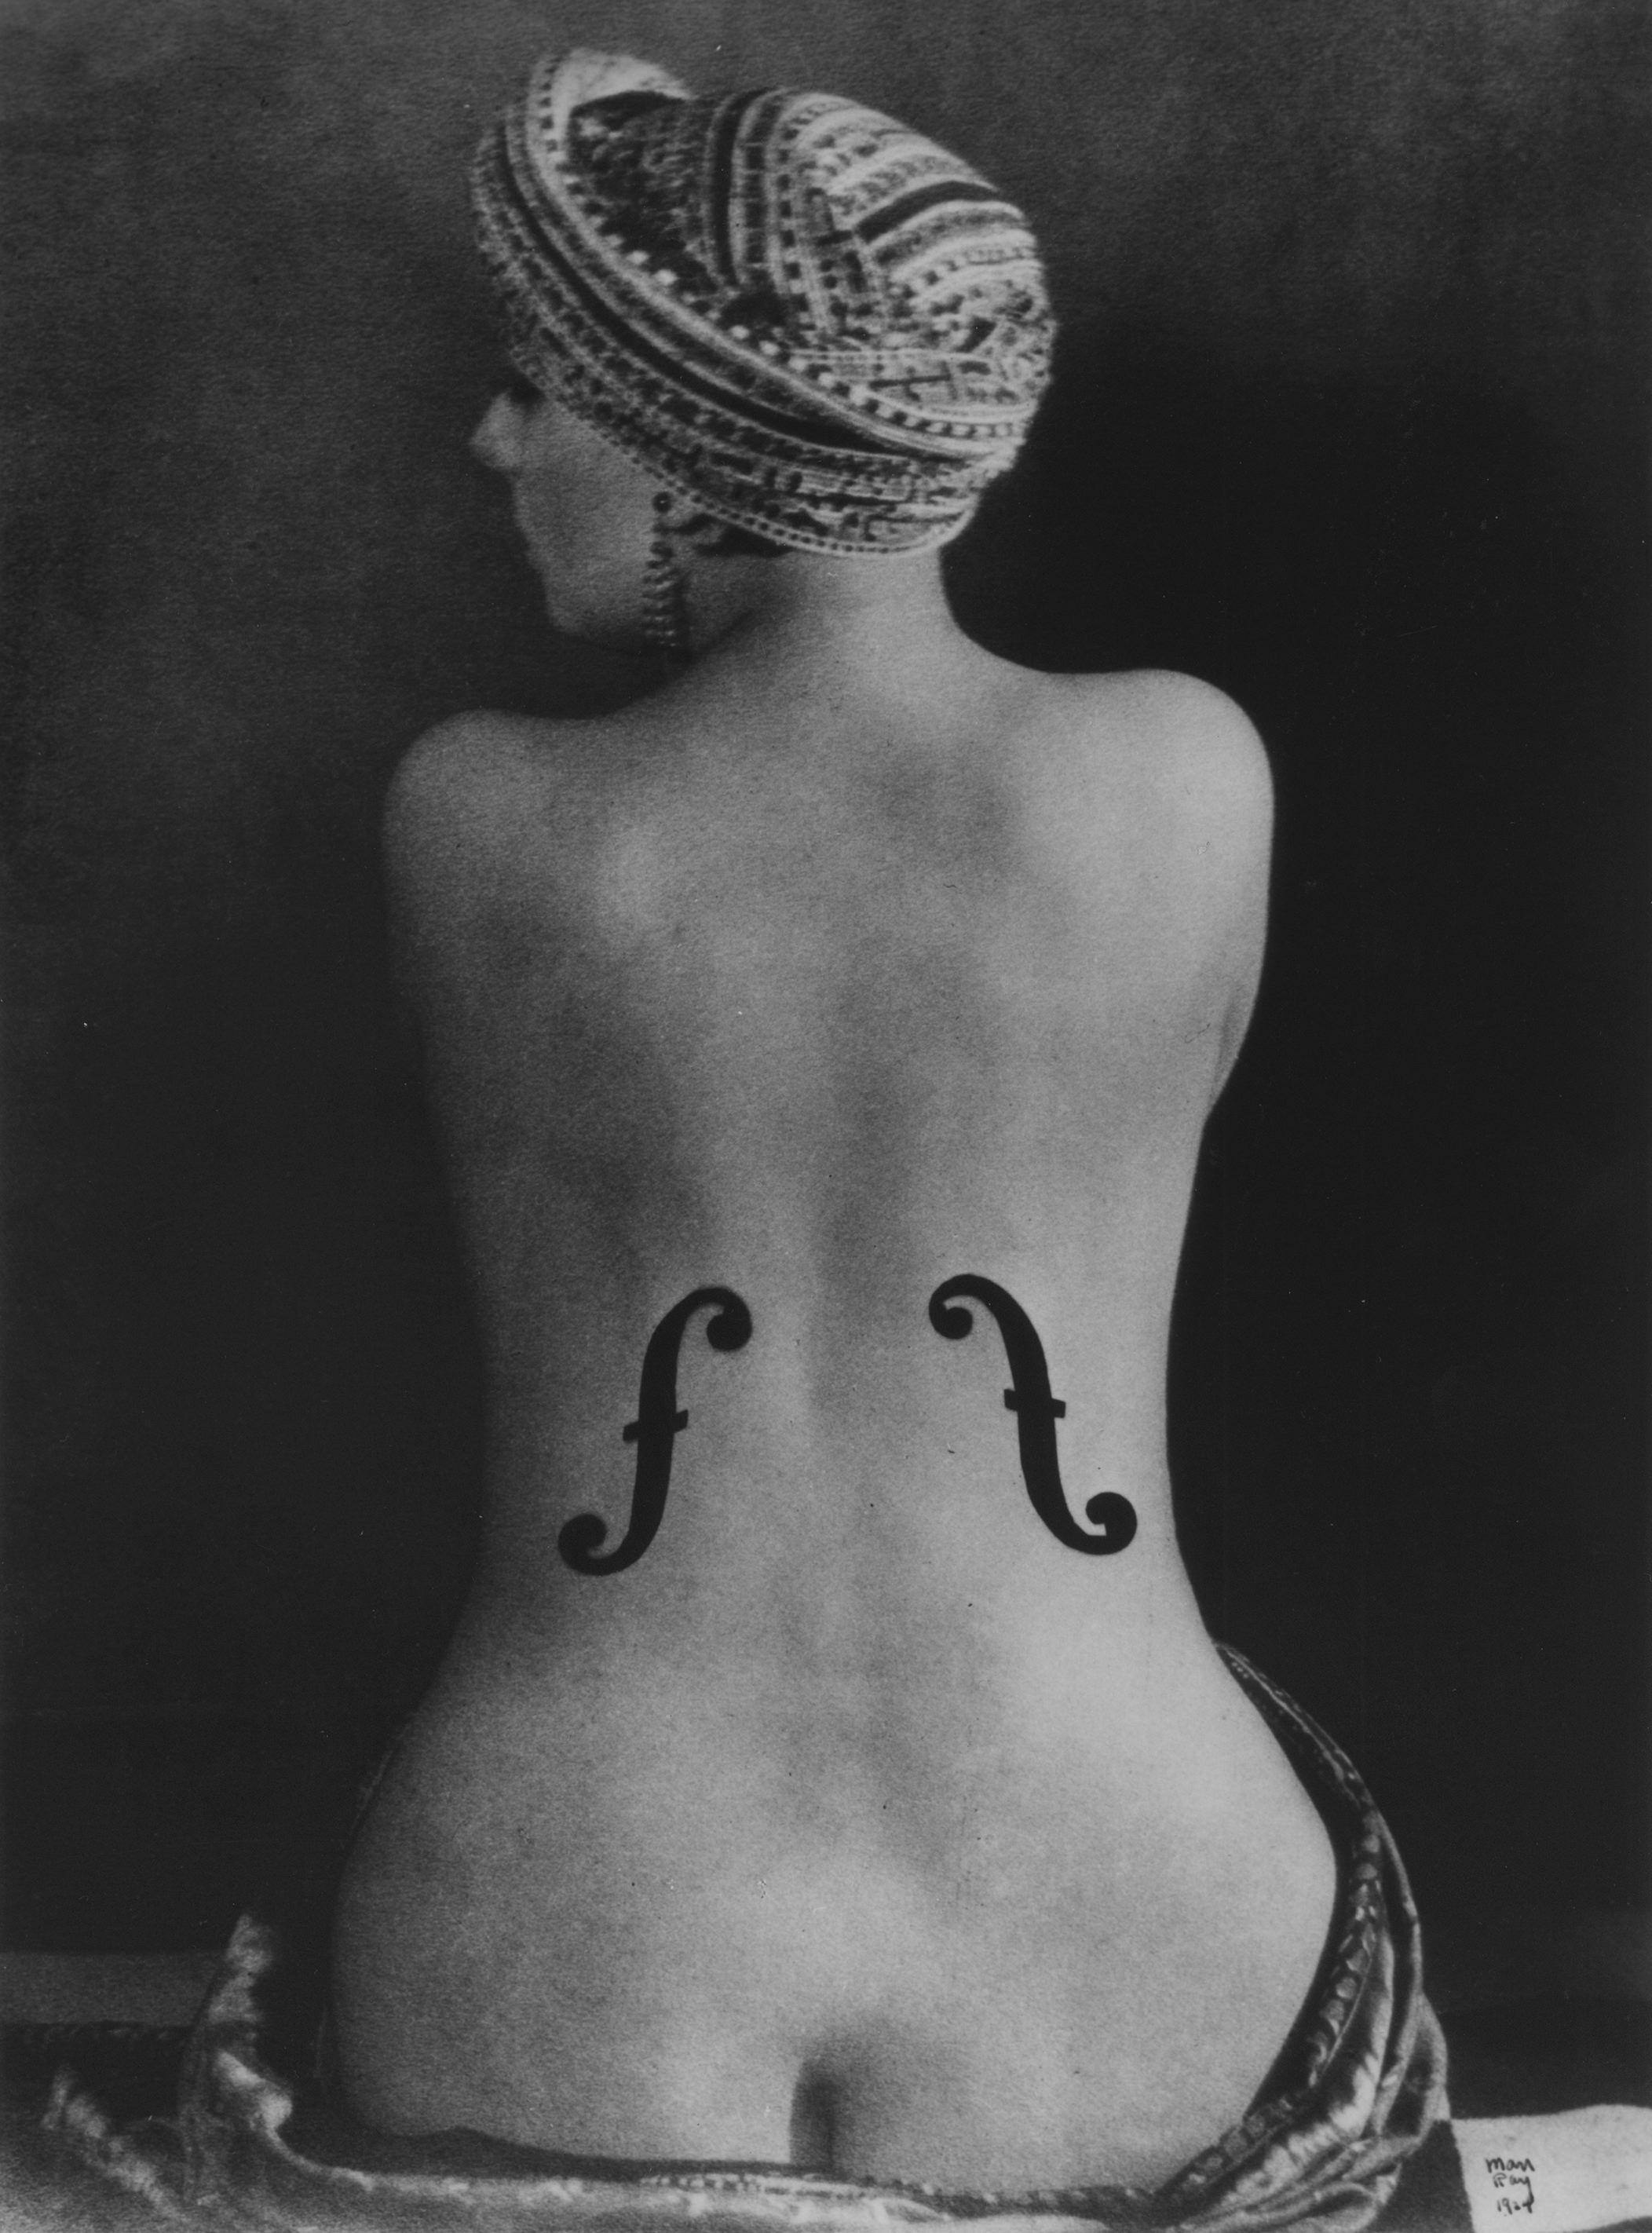 Man Ray  Violon d'Ingres, 1924 (1990) Courtesy Galerie Johannes Faber © MAN RAY TRUST/Bildrecht, Wien, 2017/18